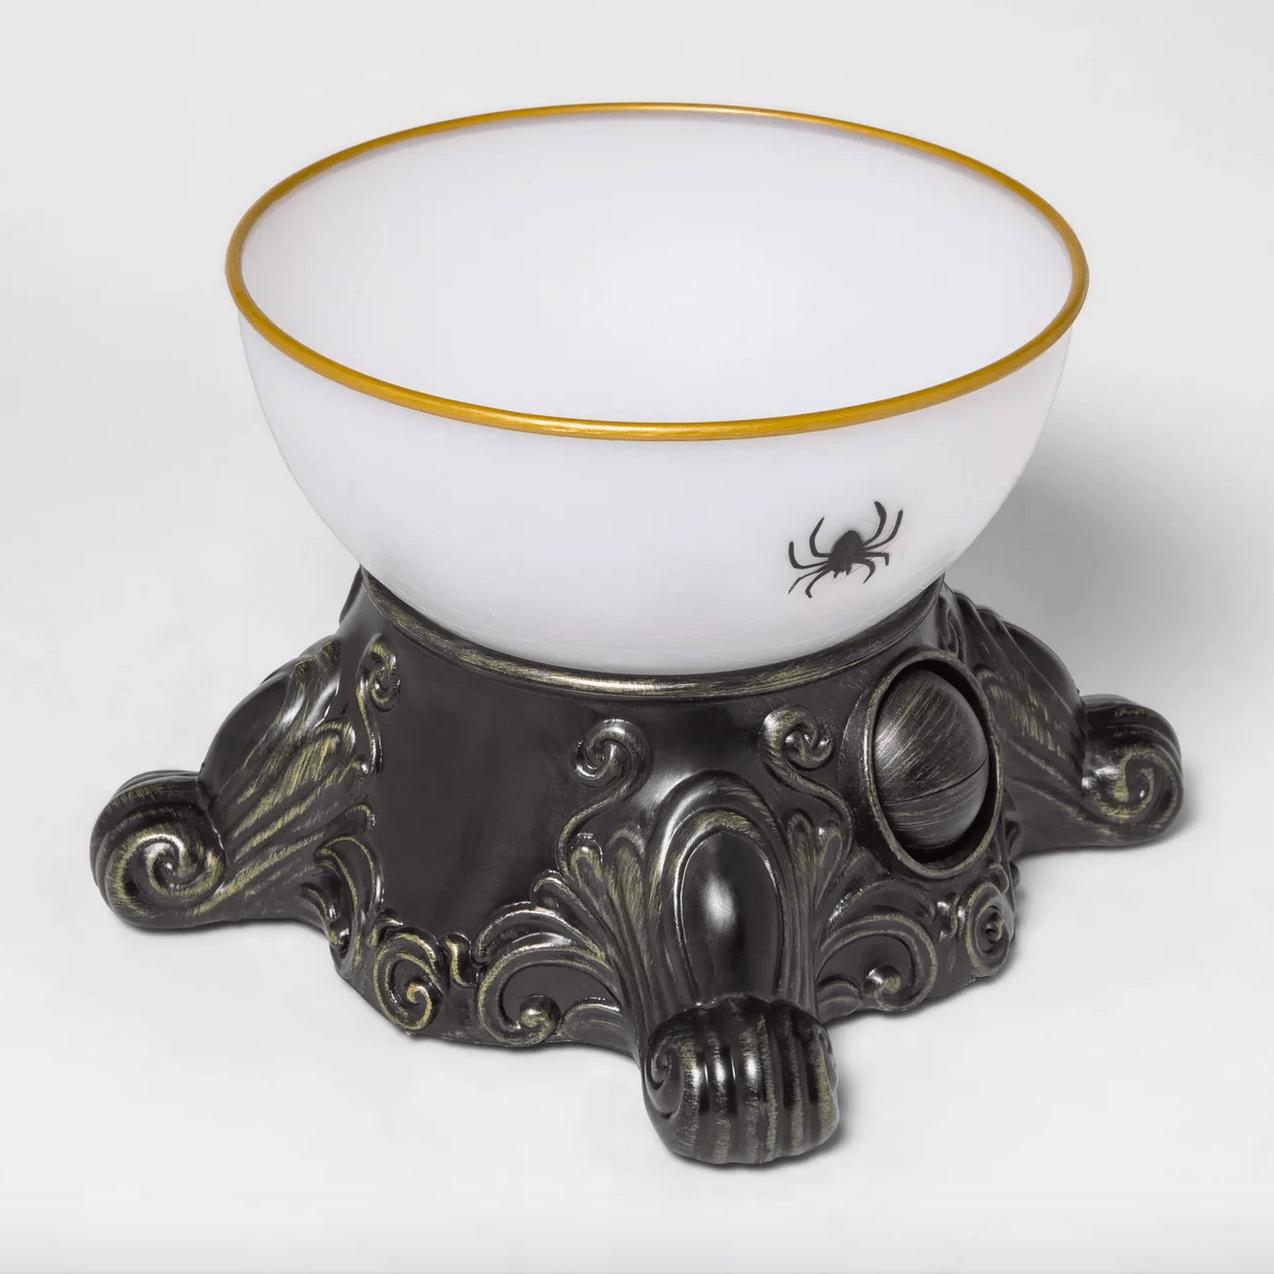 Light-up eyeball Halloween candy bowl